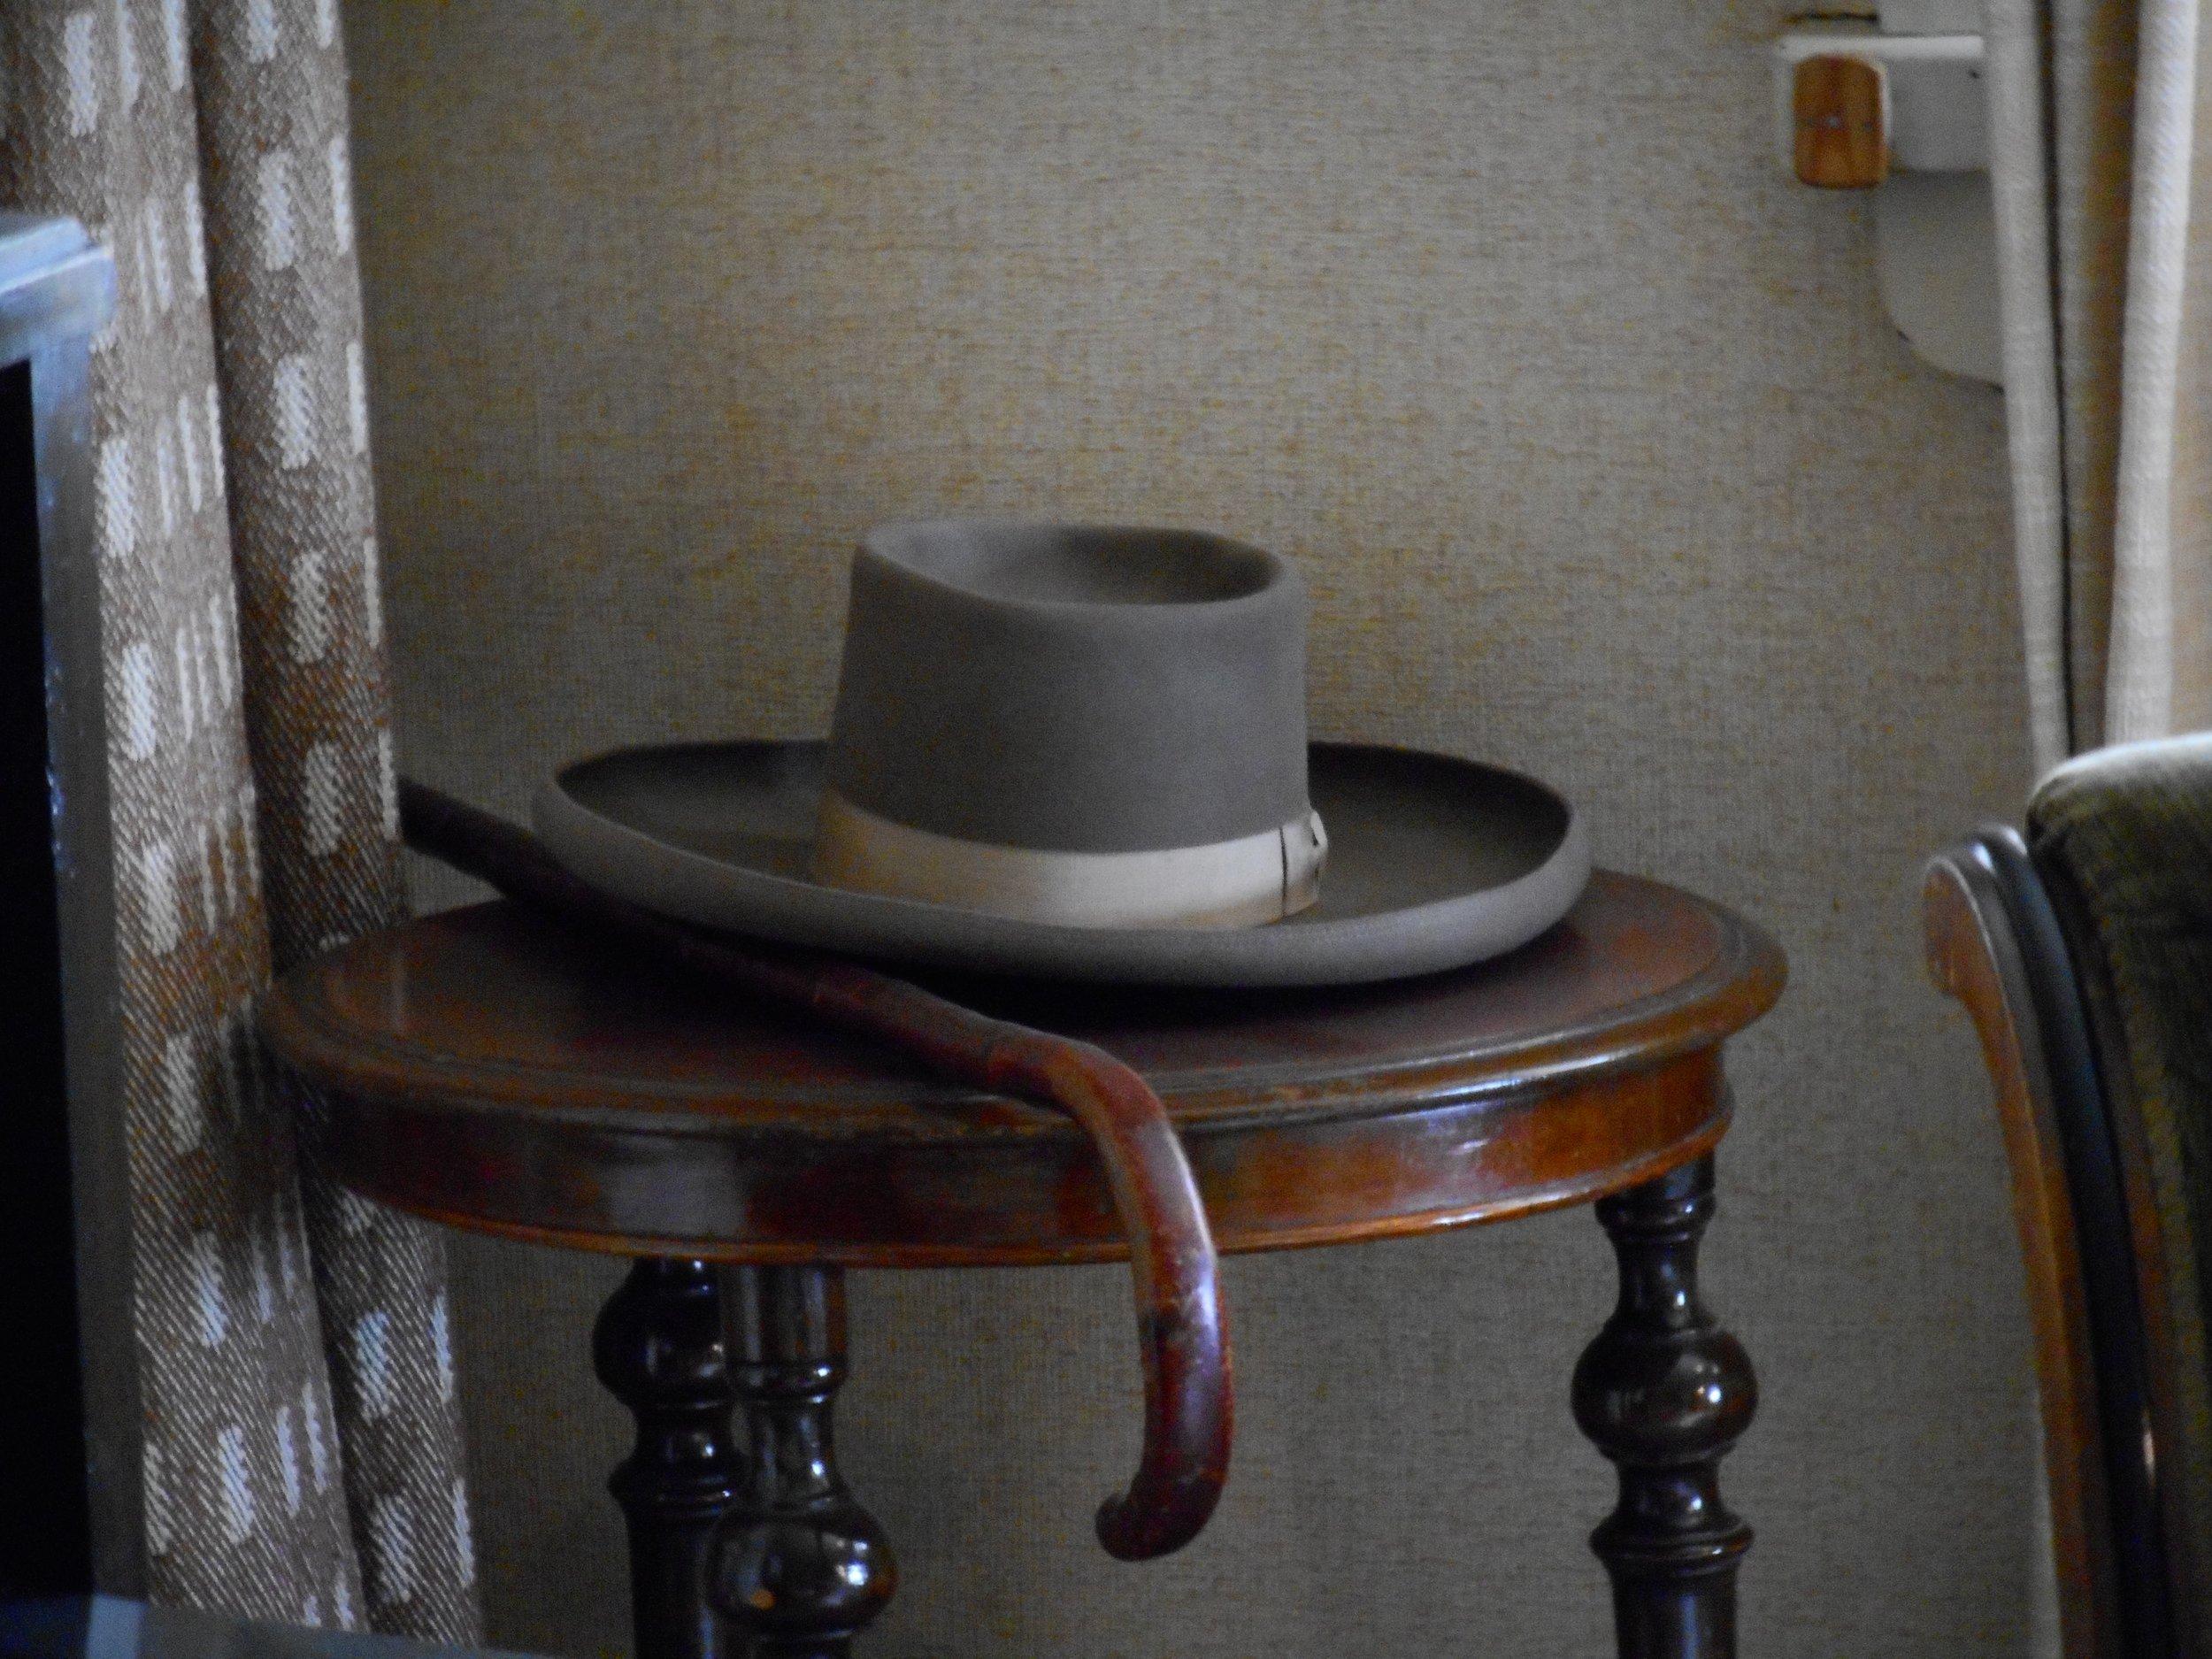 hat and walking stick of Jean Sibelius Ainola Sibelius museum